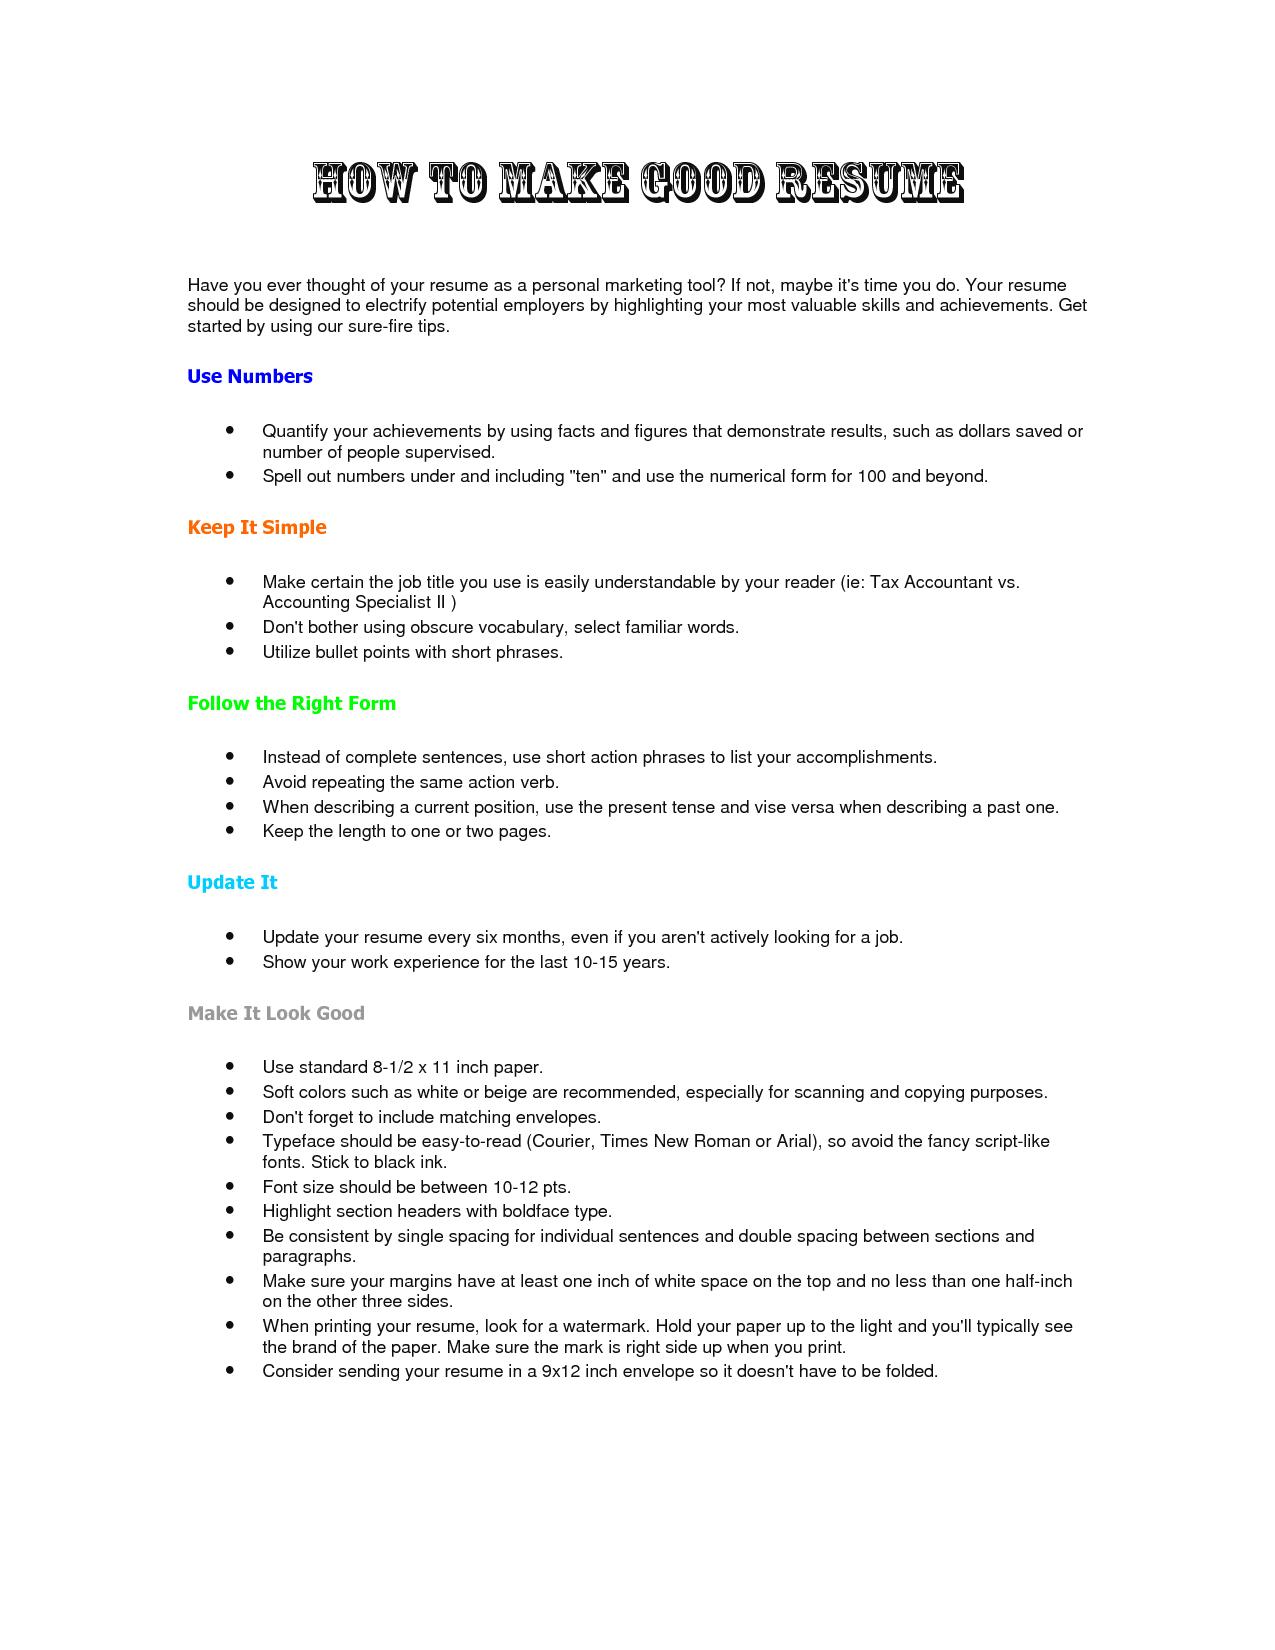 how to make a proper resume